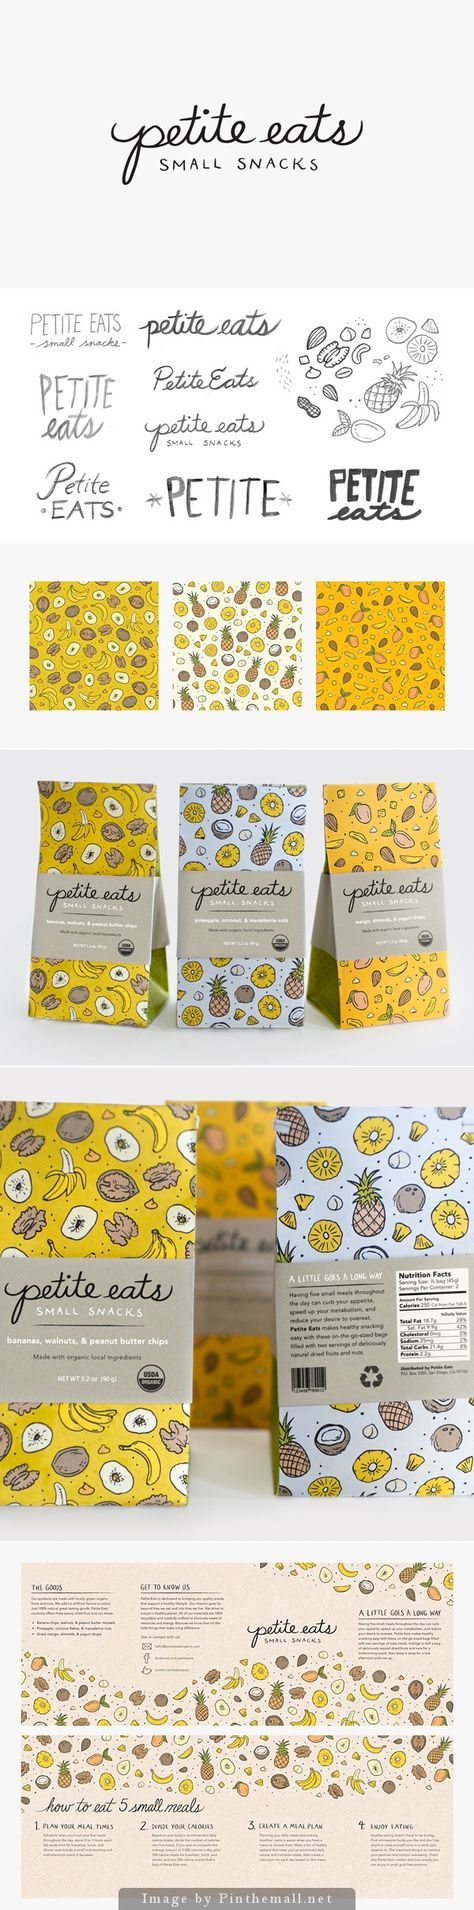 Petit Eats Healthy Snack Foods Packaging Design PD